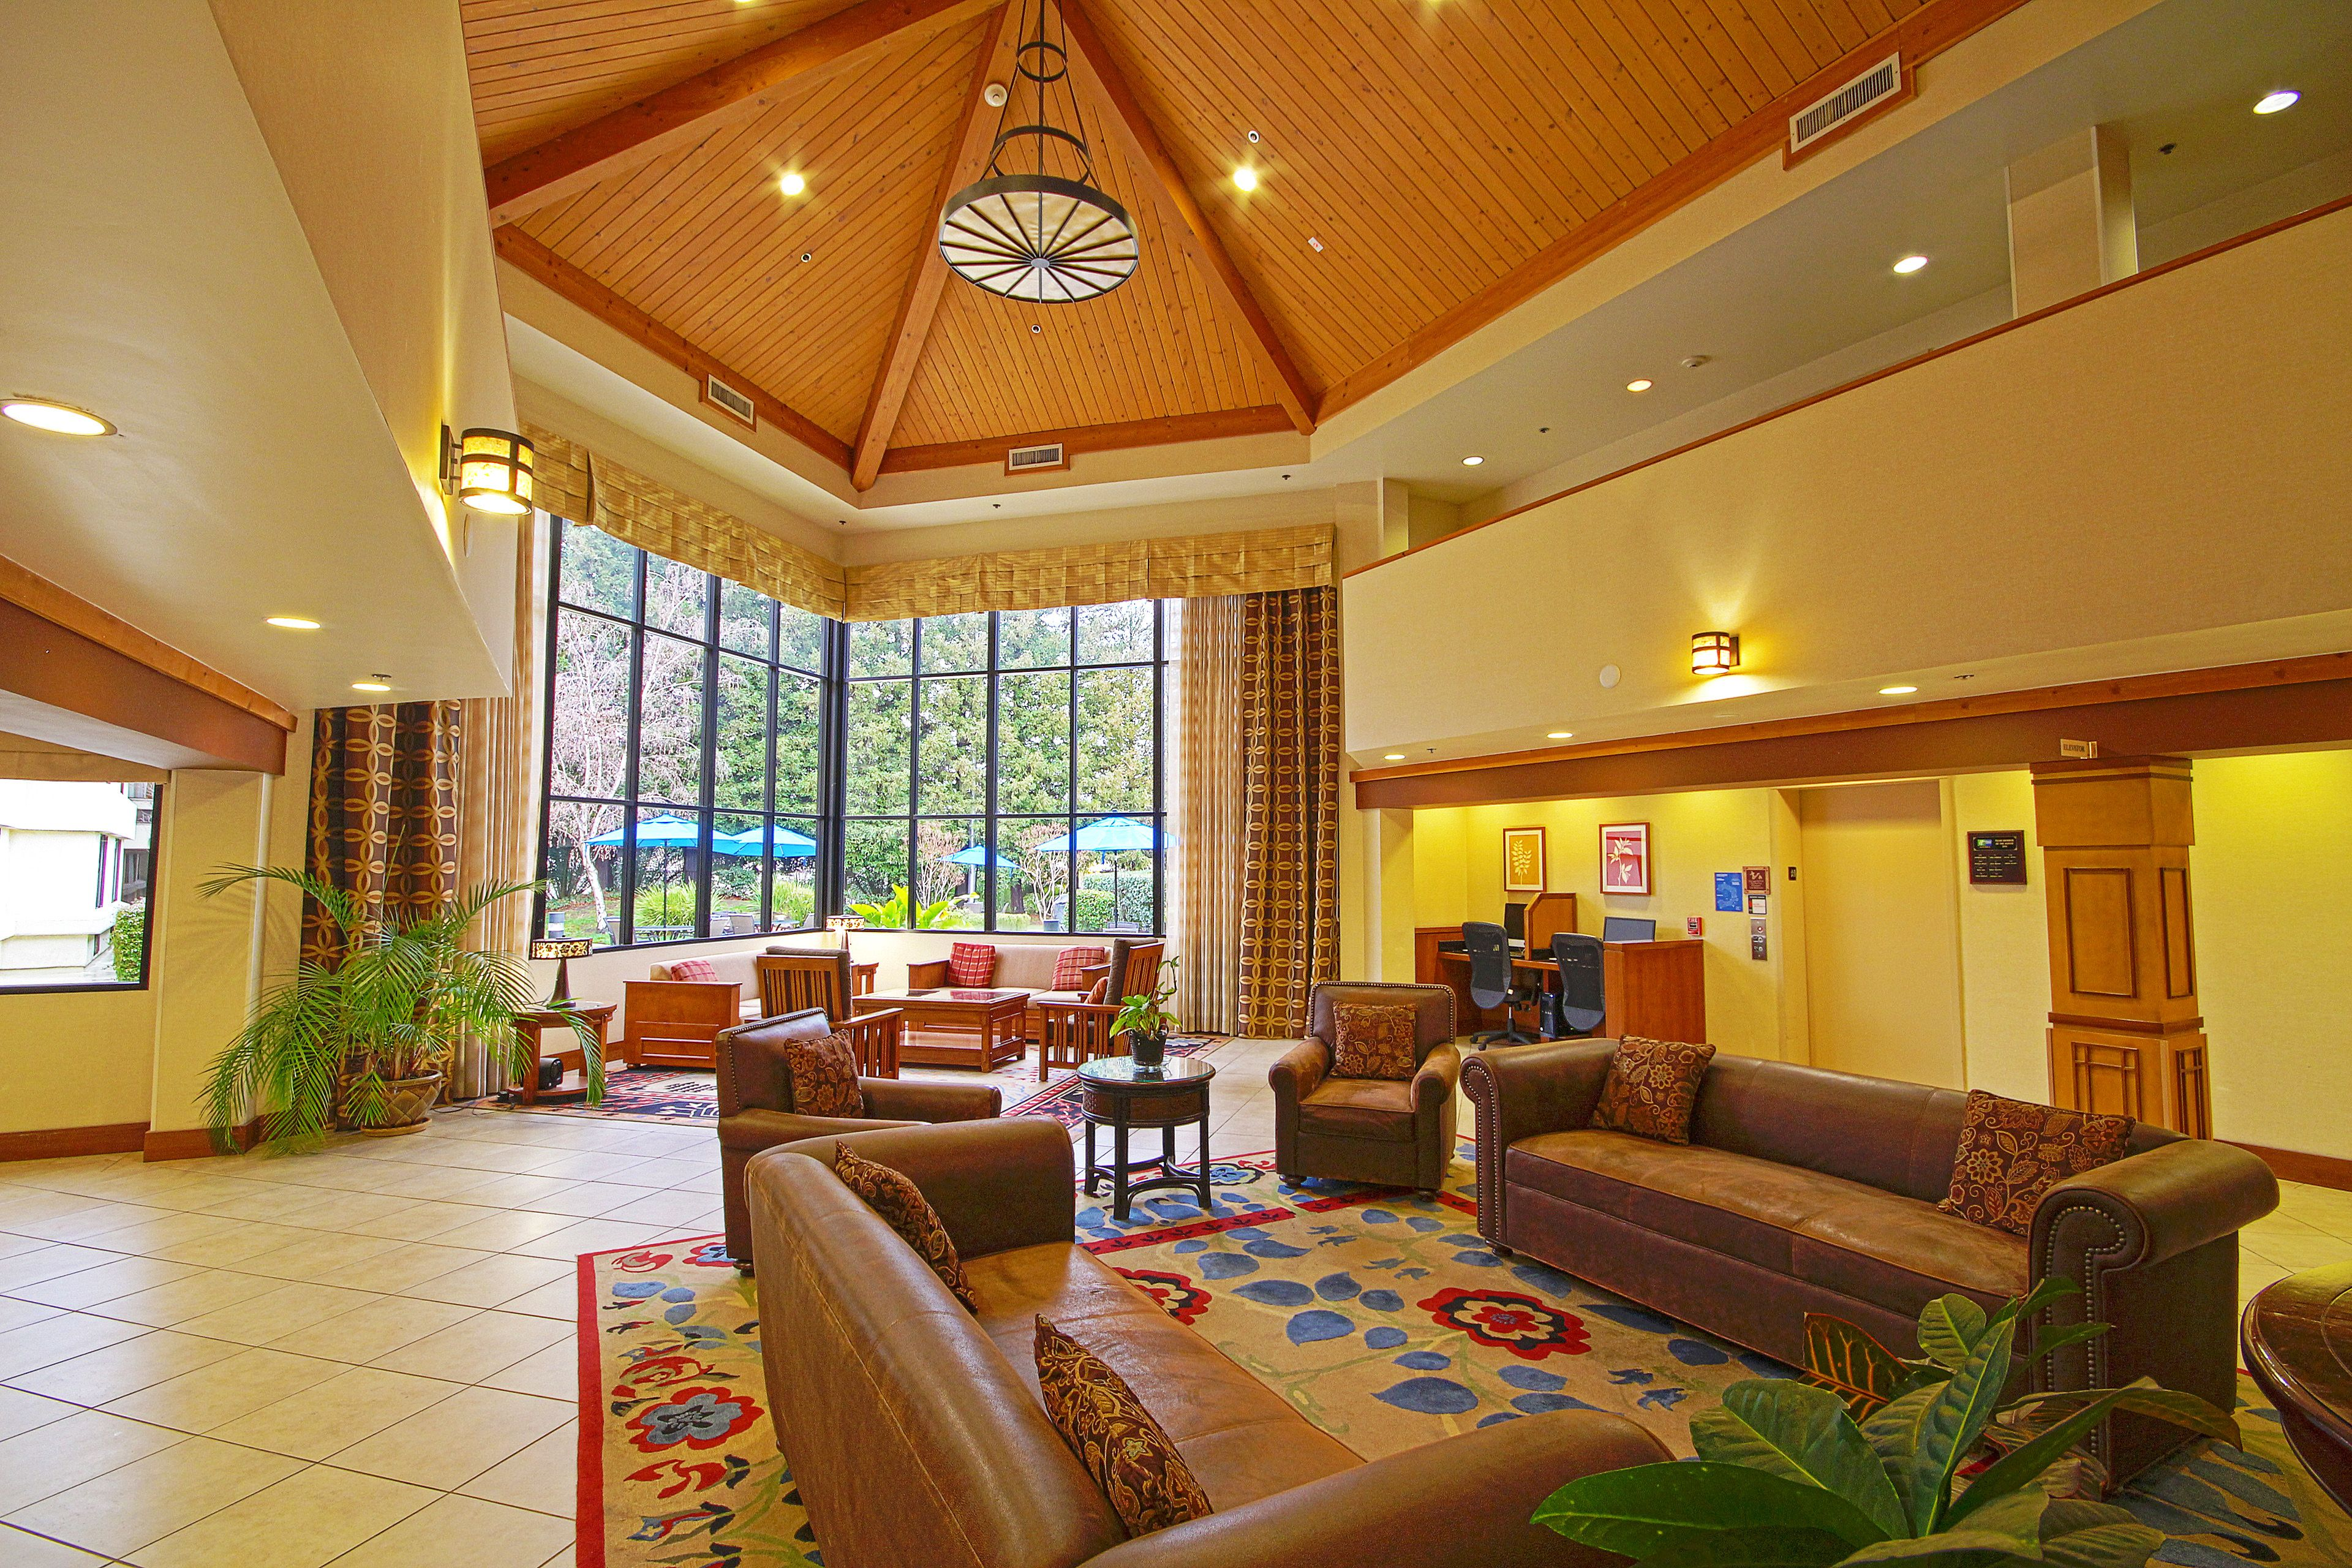 Holiday Inn Express Walnut Creek image 4